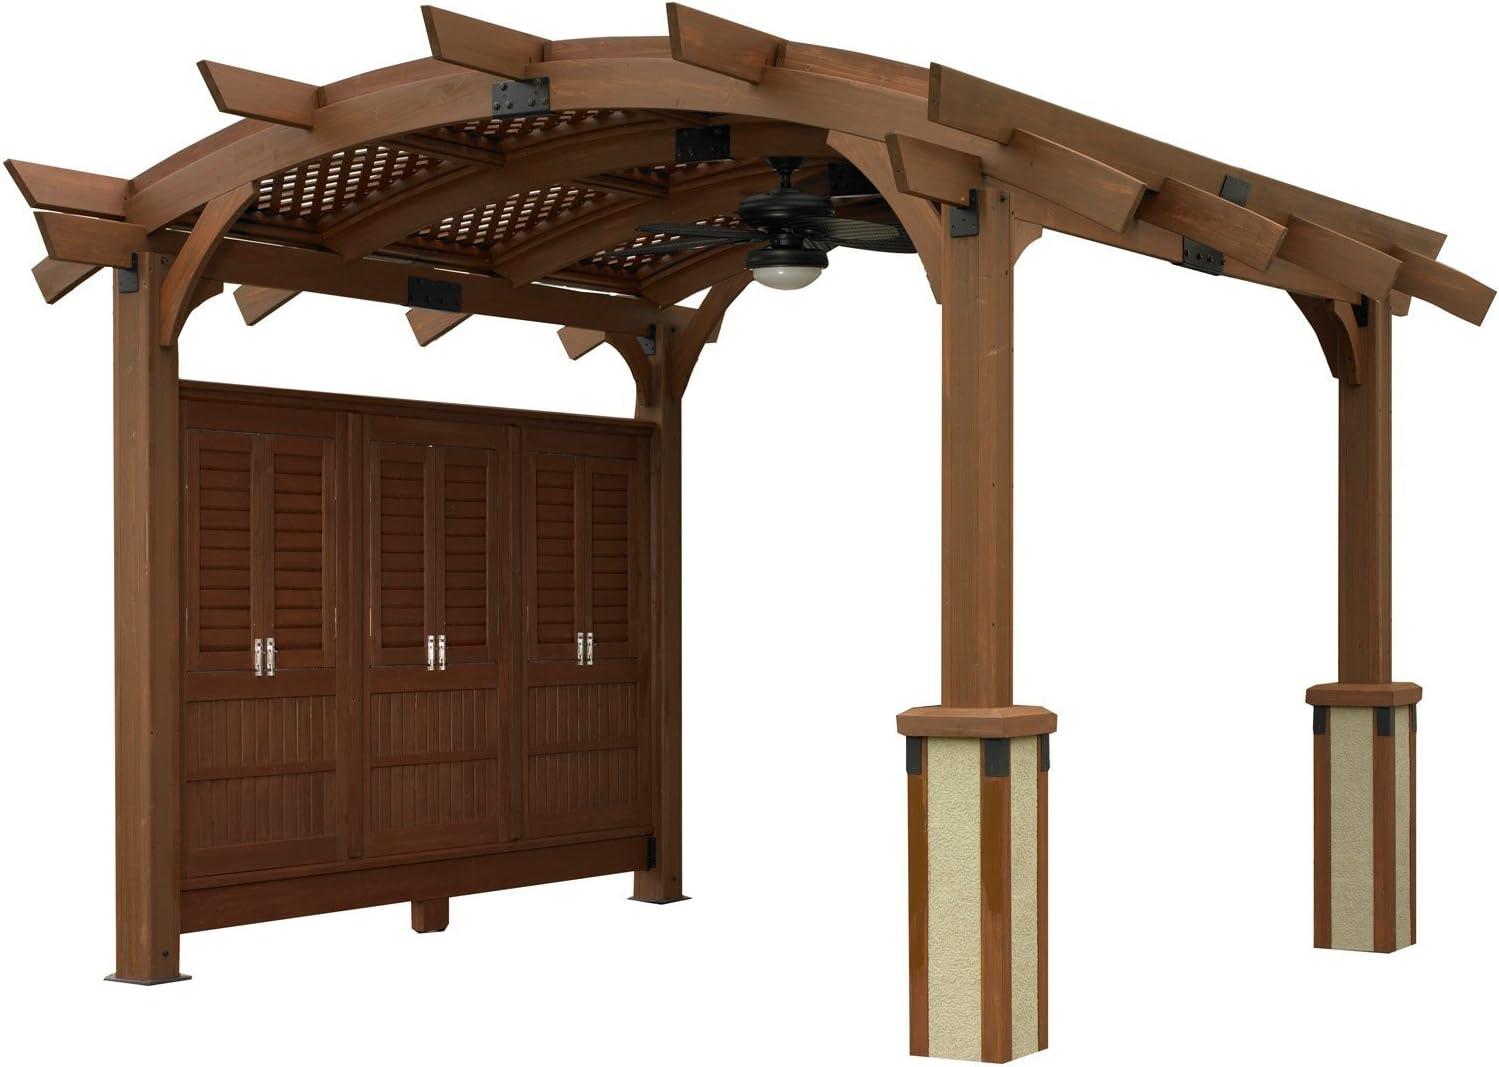 Sonoma arco madera Pergola: Amazon.es: Jardín